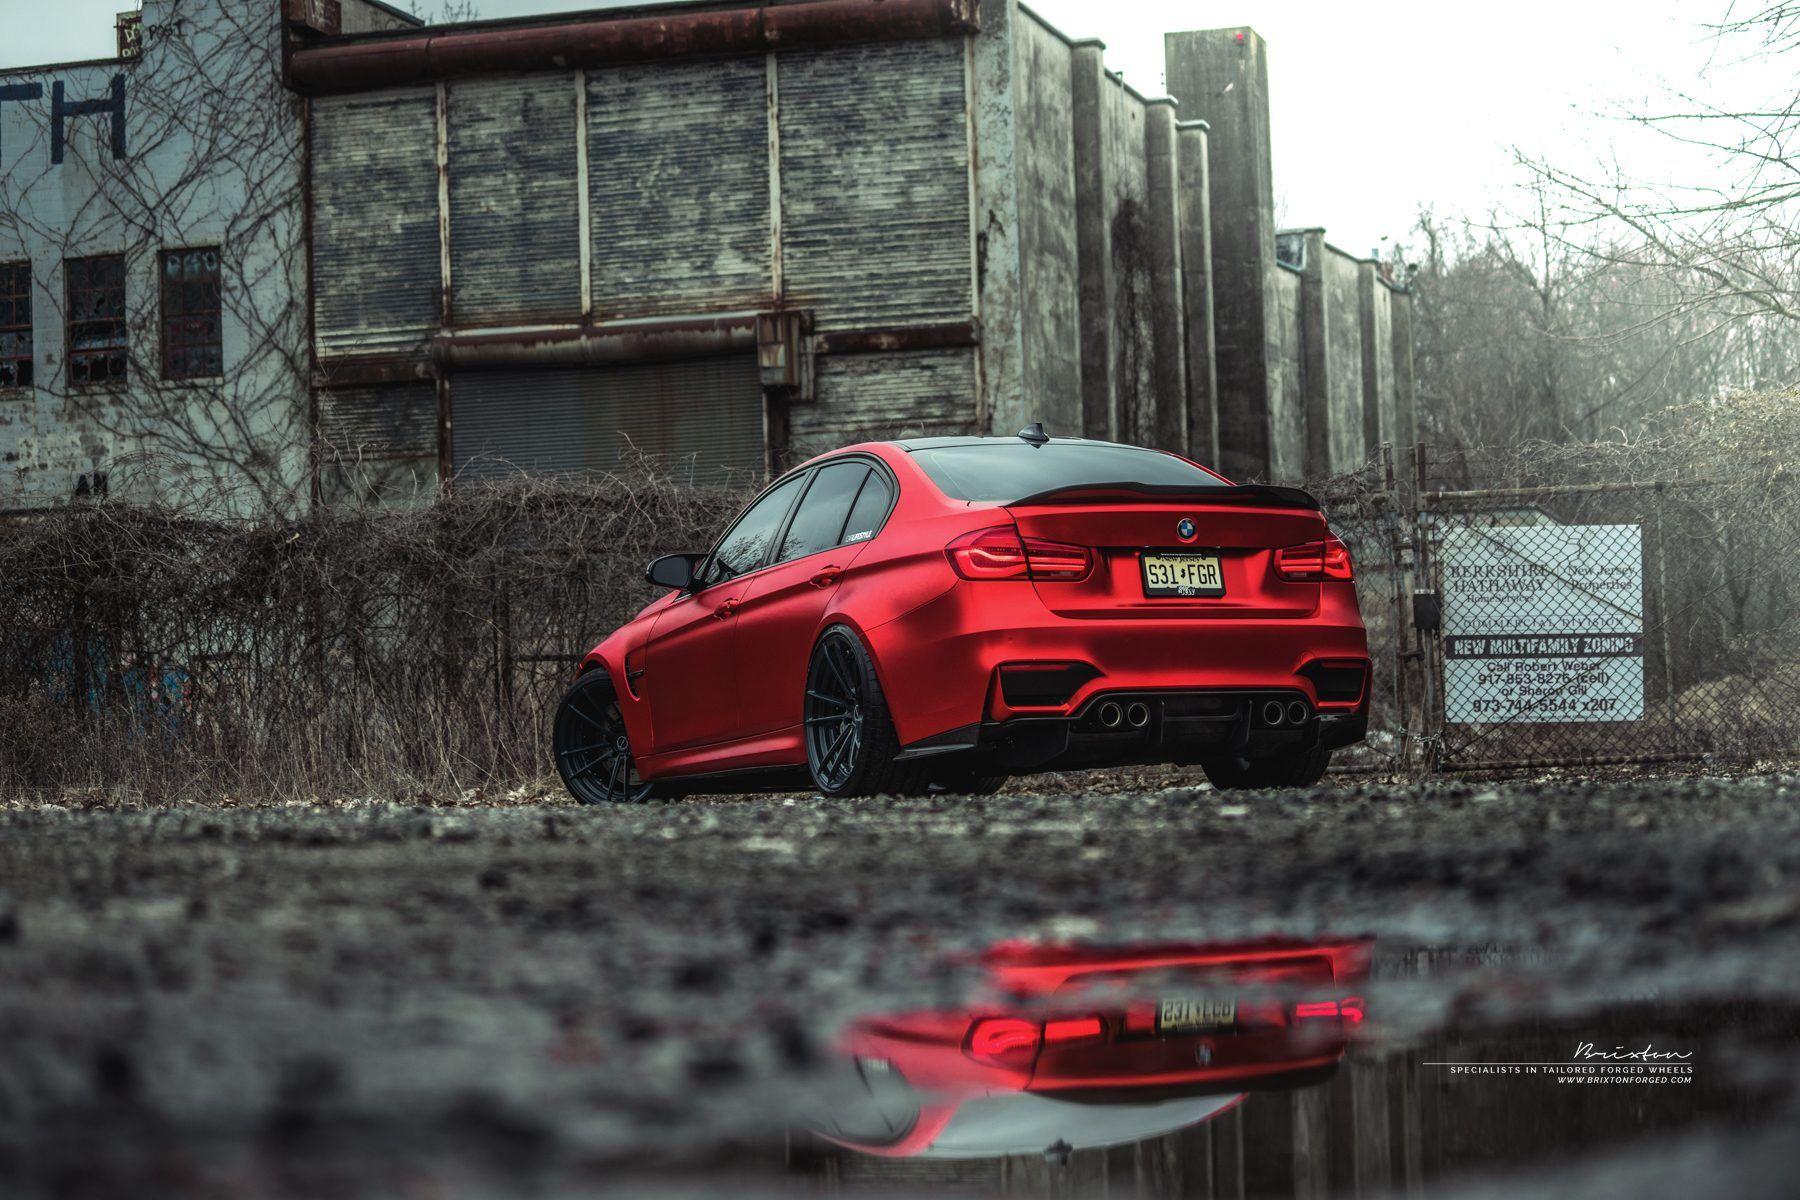 Red F80 M3 Bmw